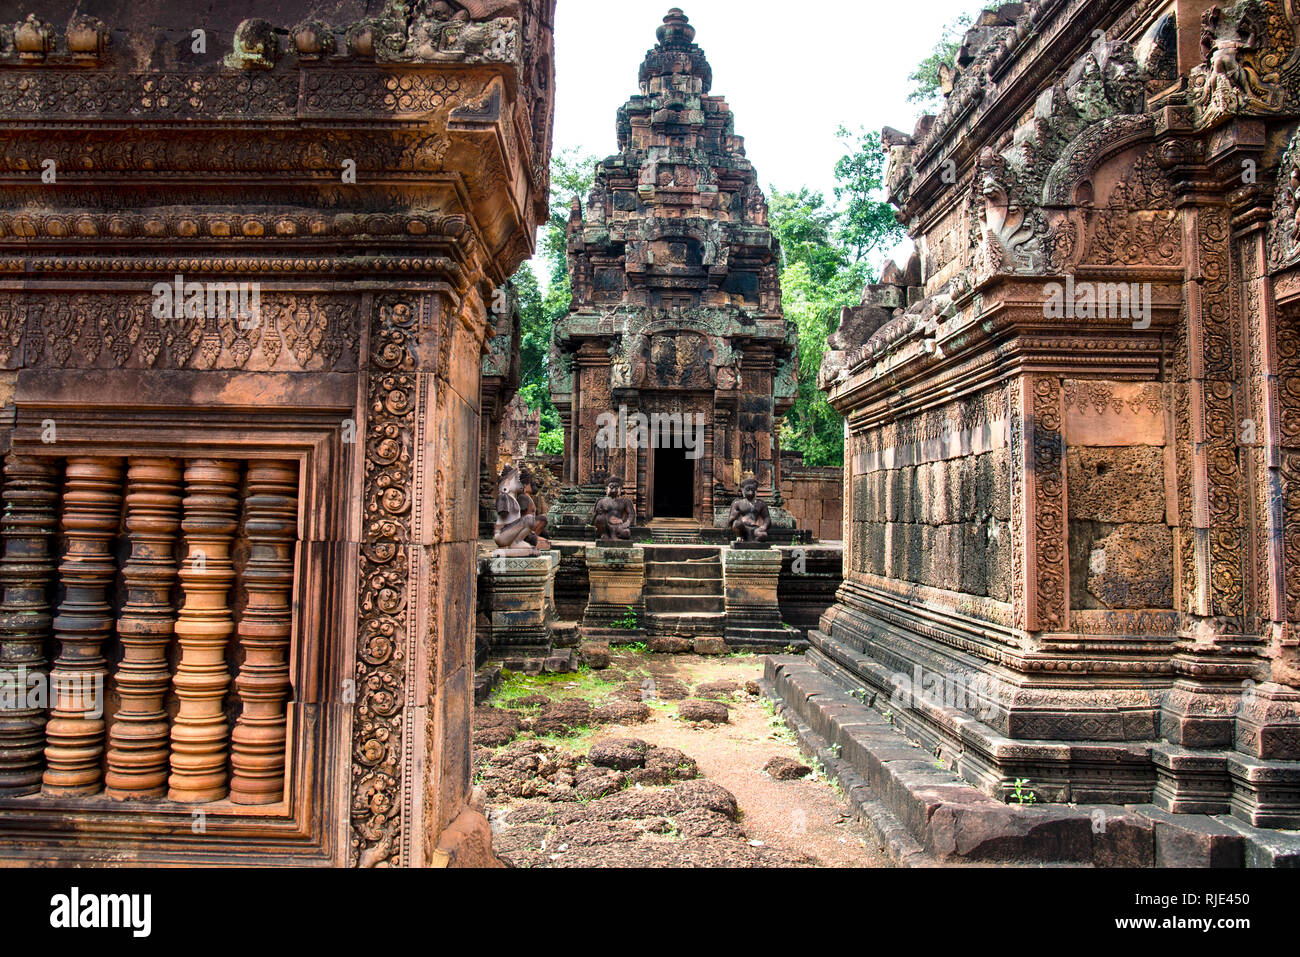 Interior of Banteay Srei Angkor Wat Temple - Stock Image